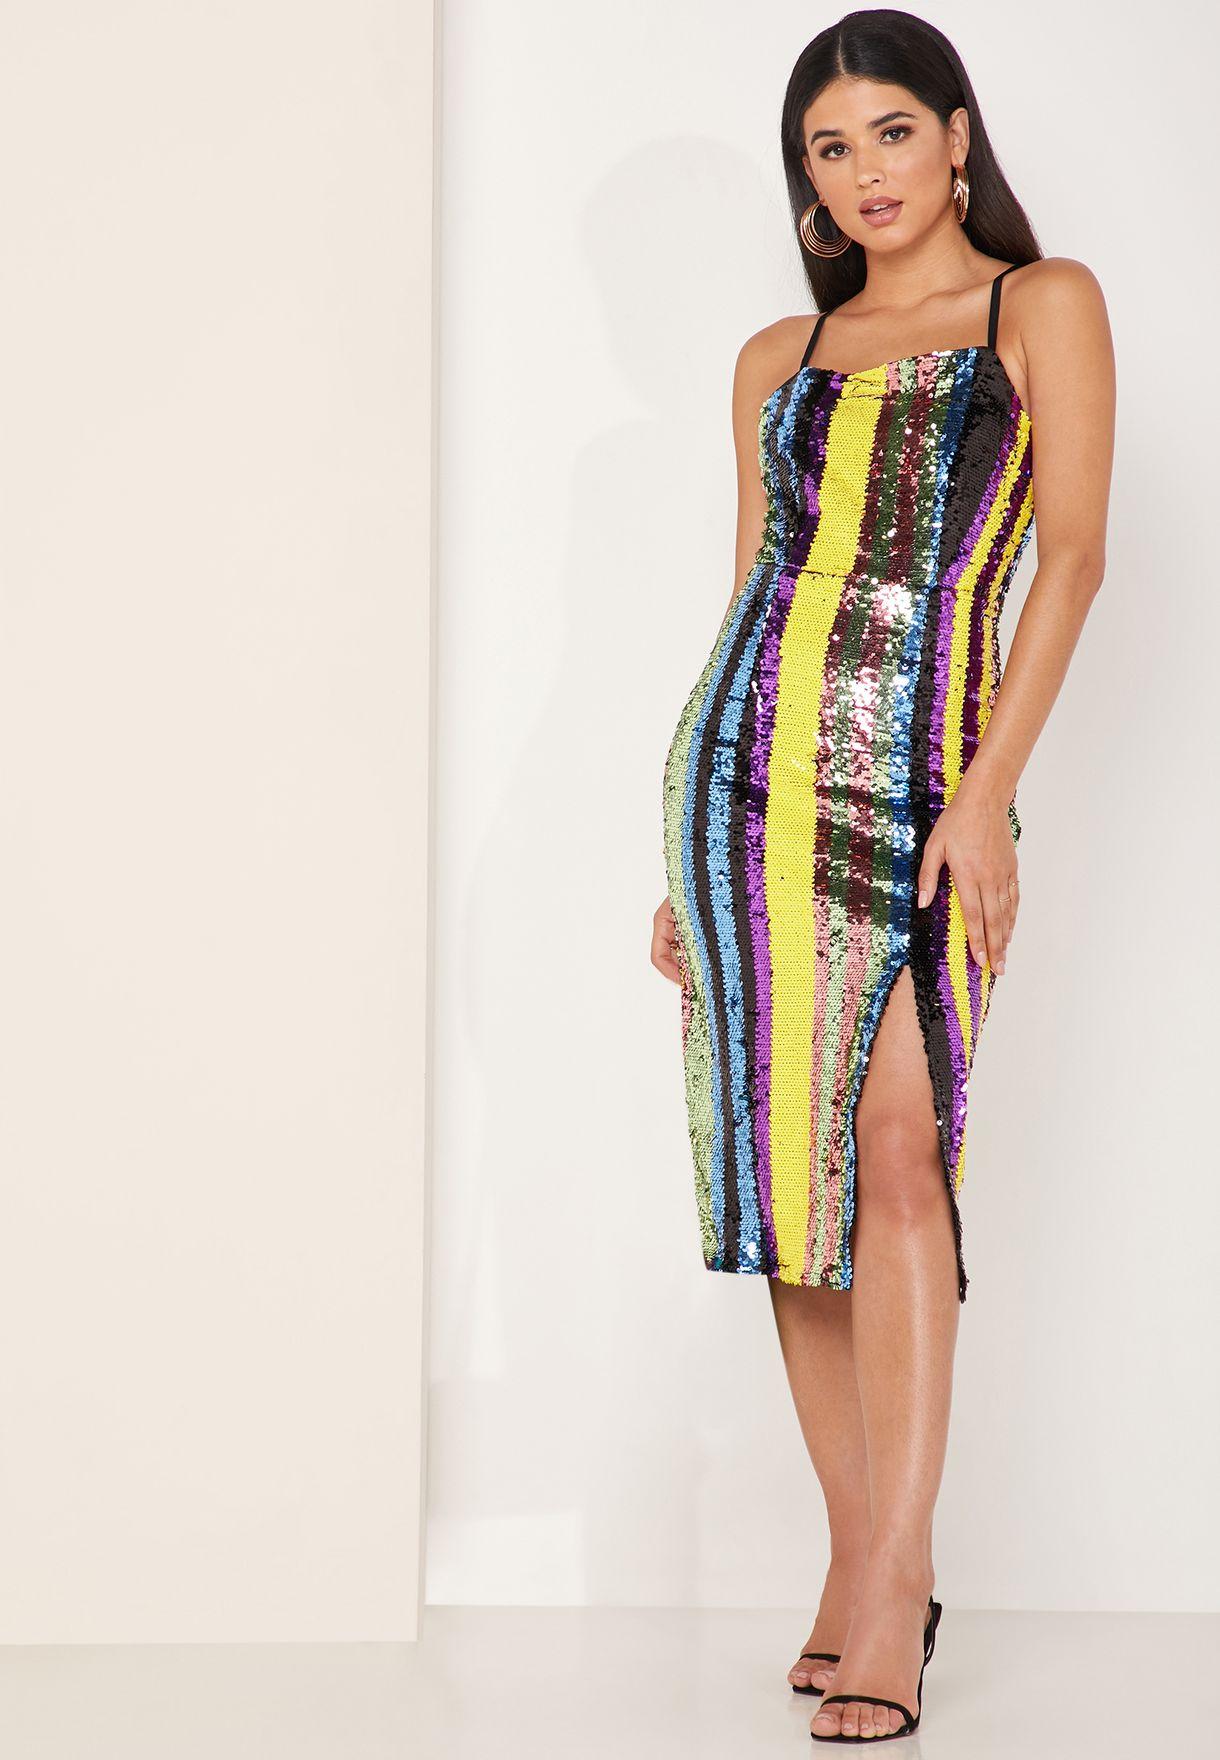 Influencer Striped Sequin Dress